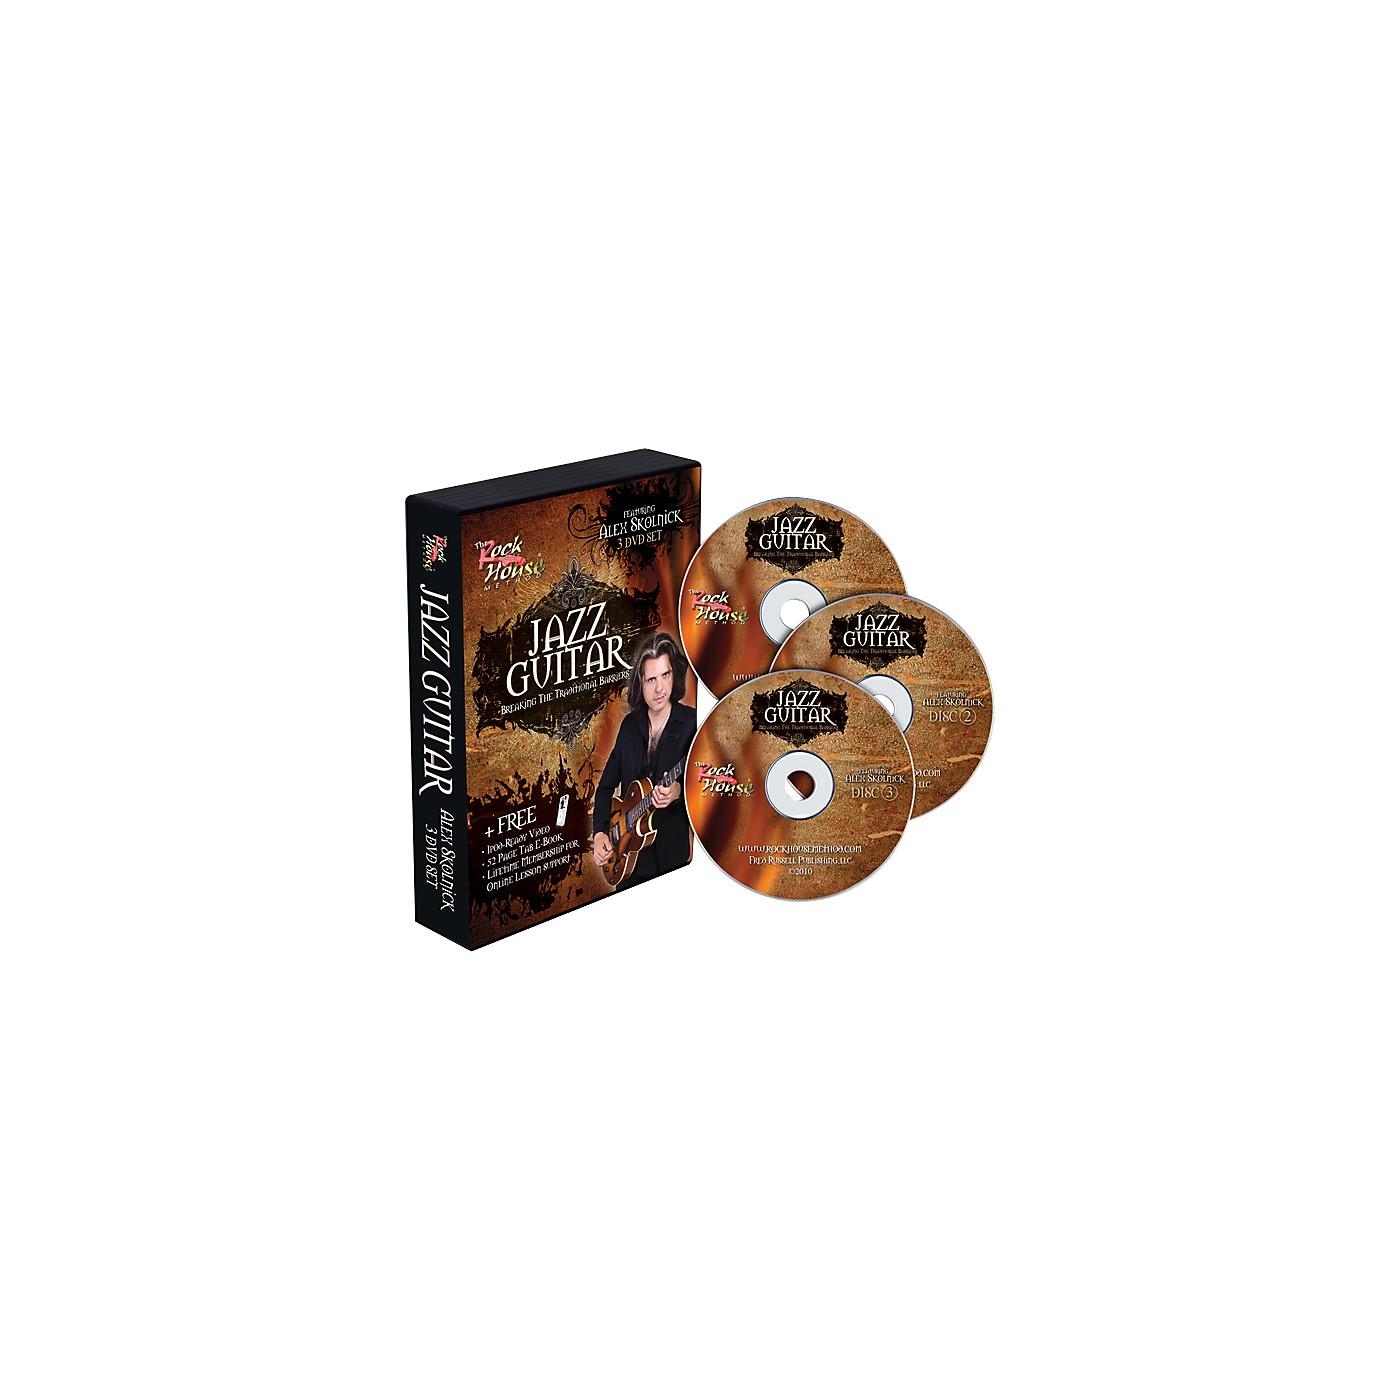 Rock House Alex Skolnick Jazz Guitar: Breaking the Traditional Barriers 3-DVD Set thumbnail